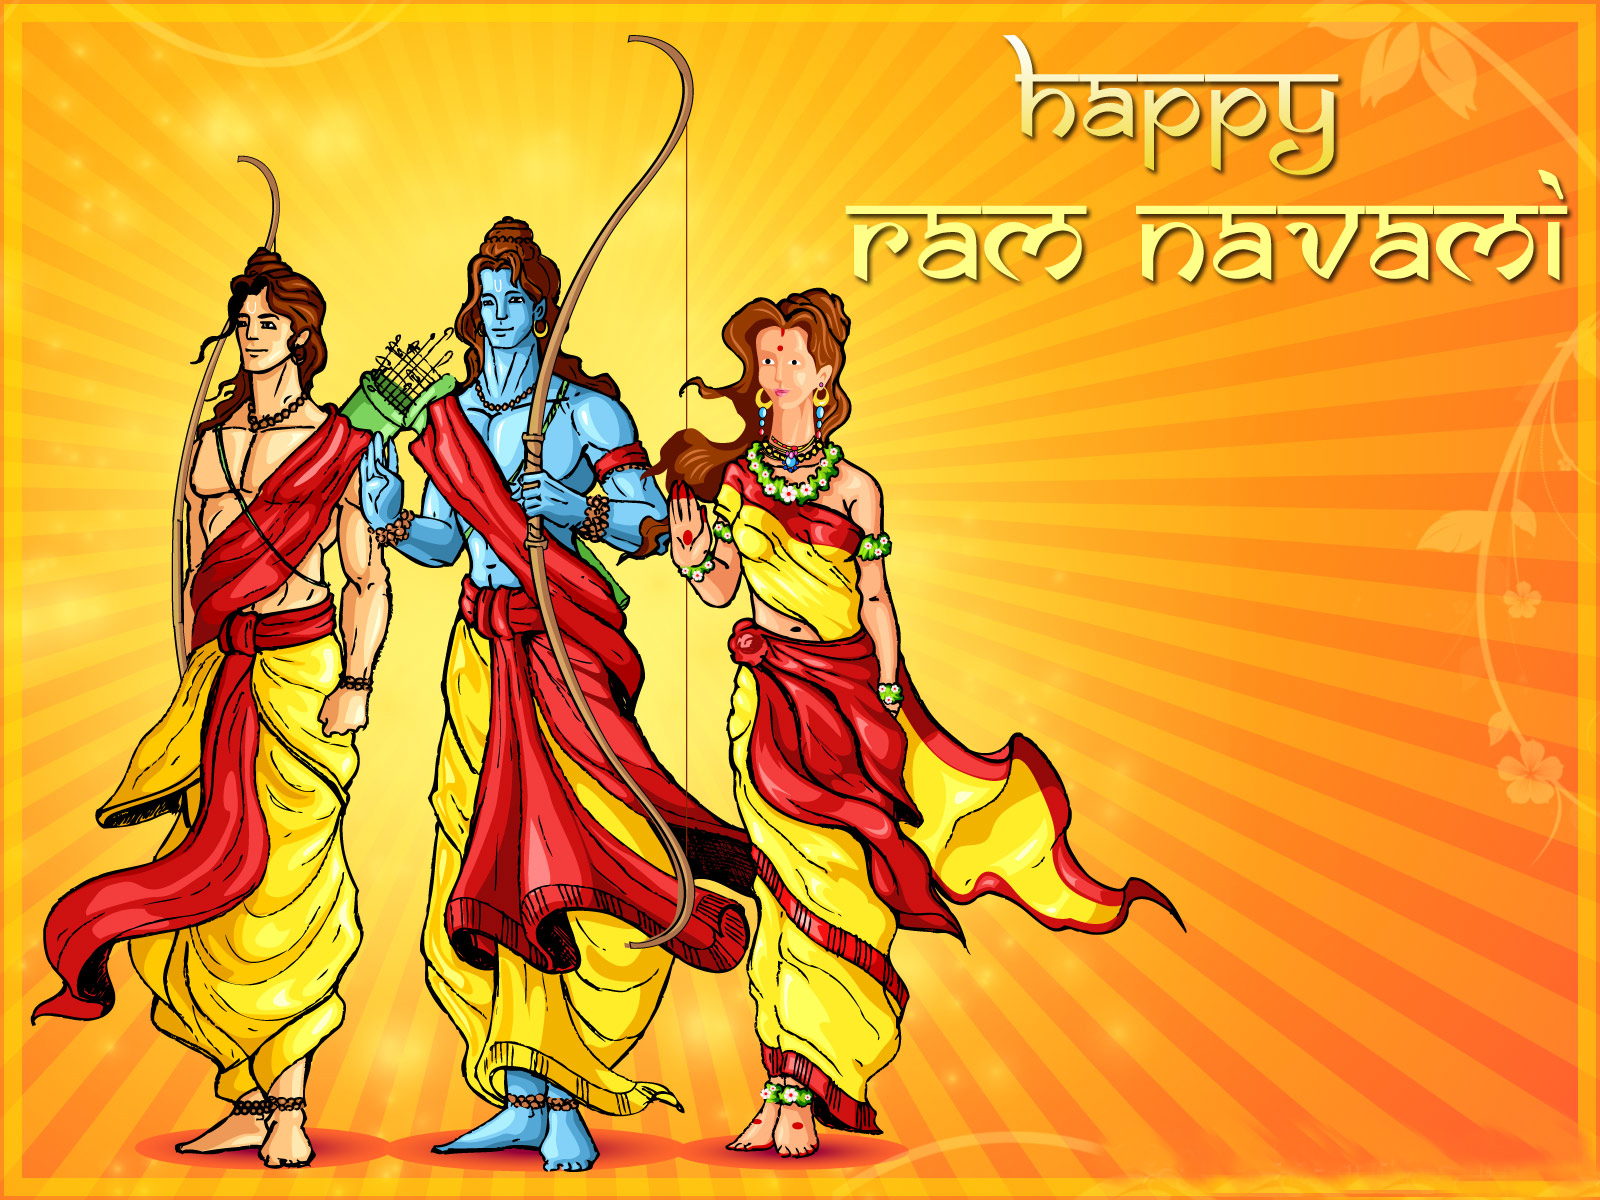 Happy-Ram-Navami-2014